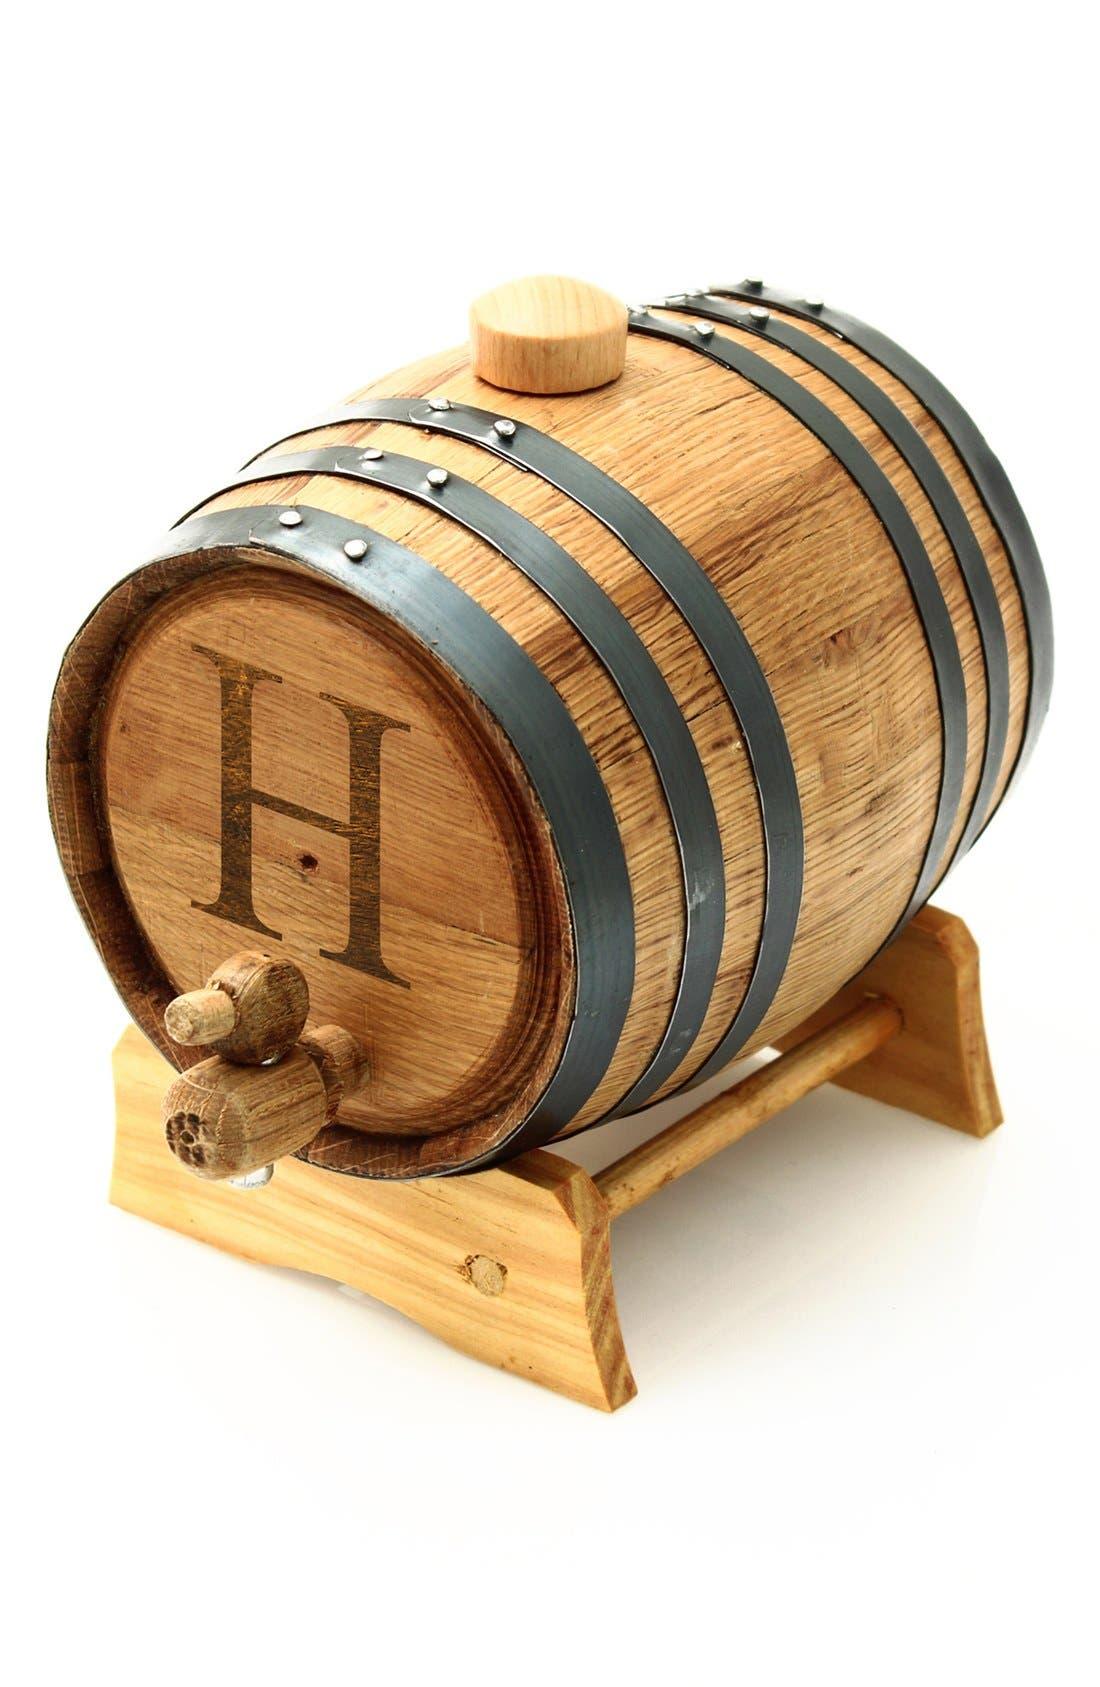 Main Image - Cathy's Concepts Monogram Oak Whiskey Barrel, Small